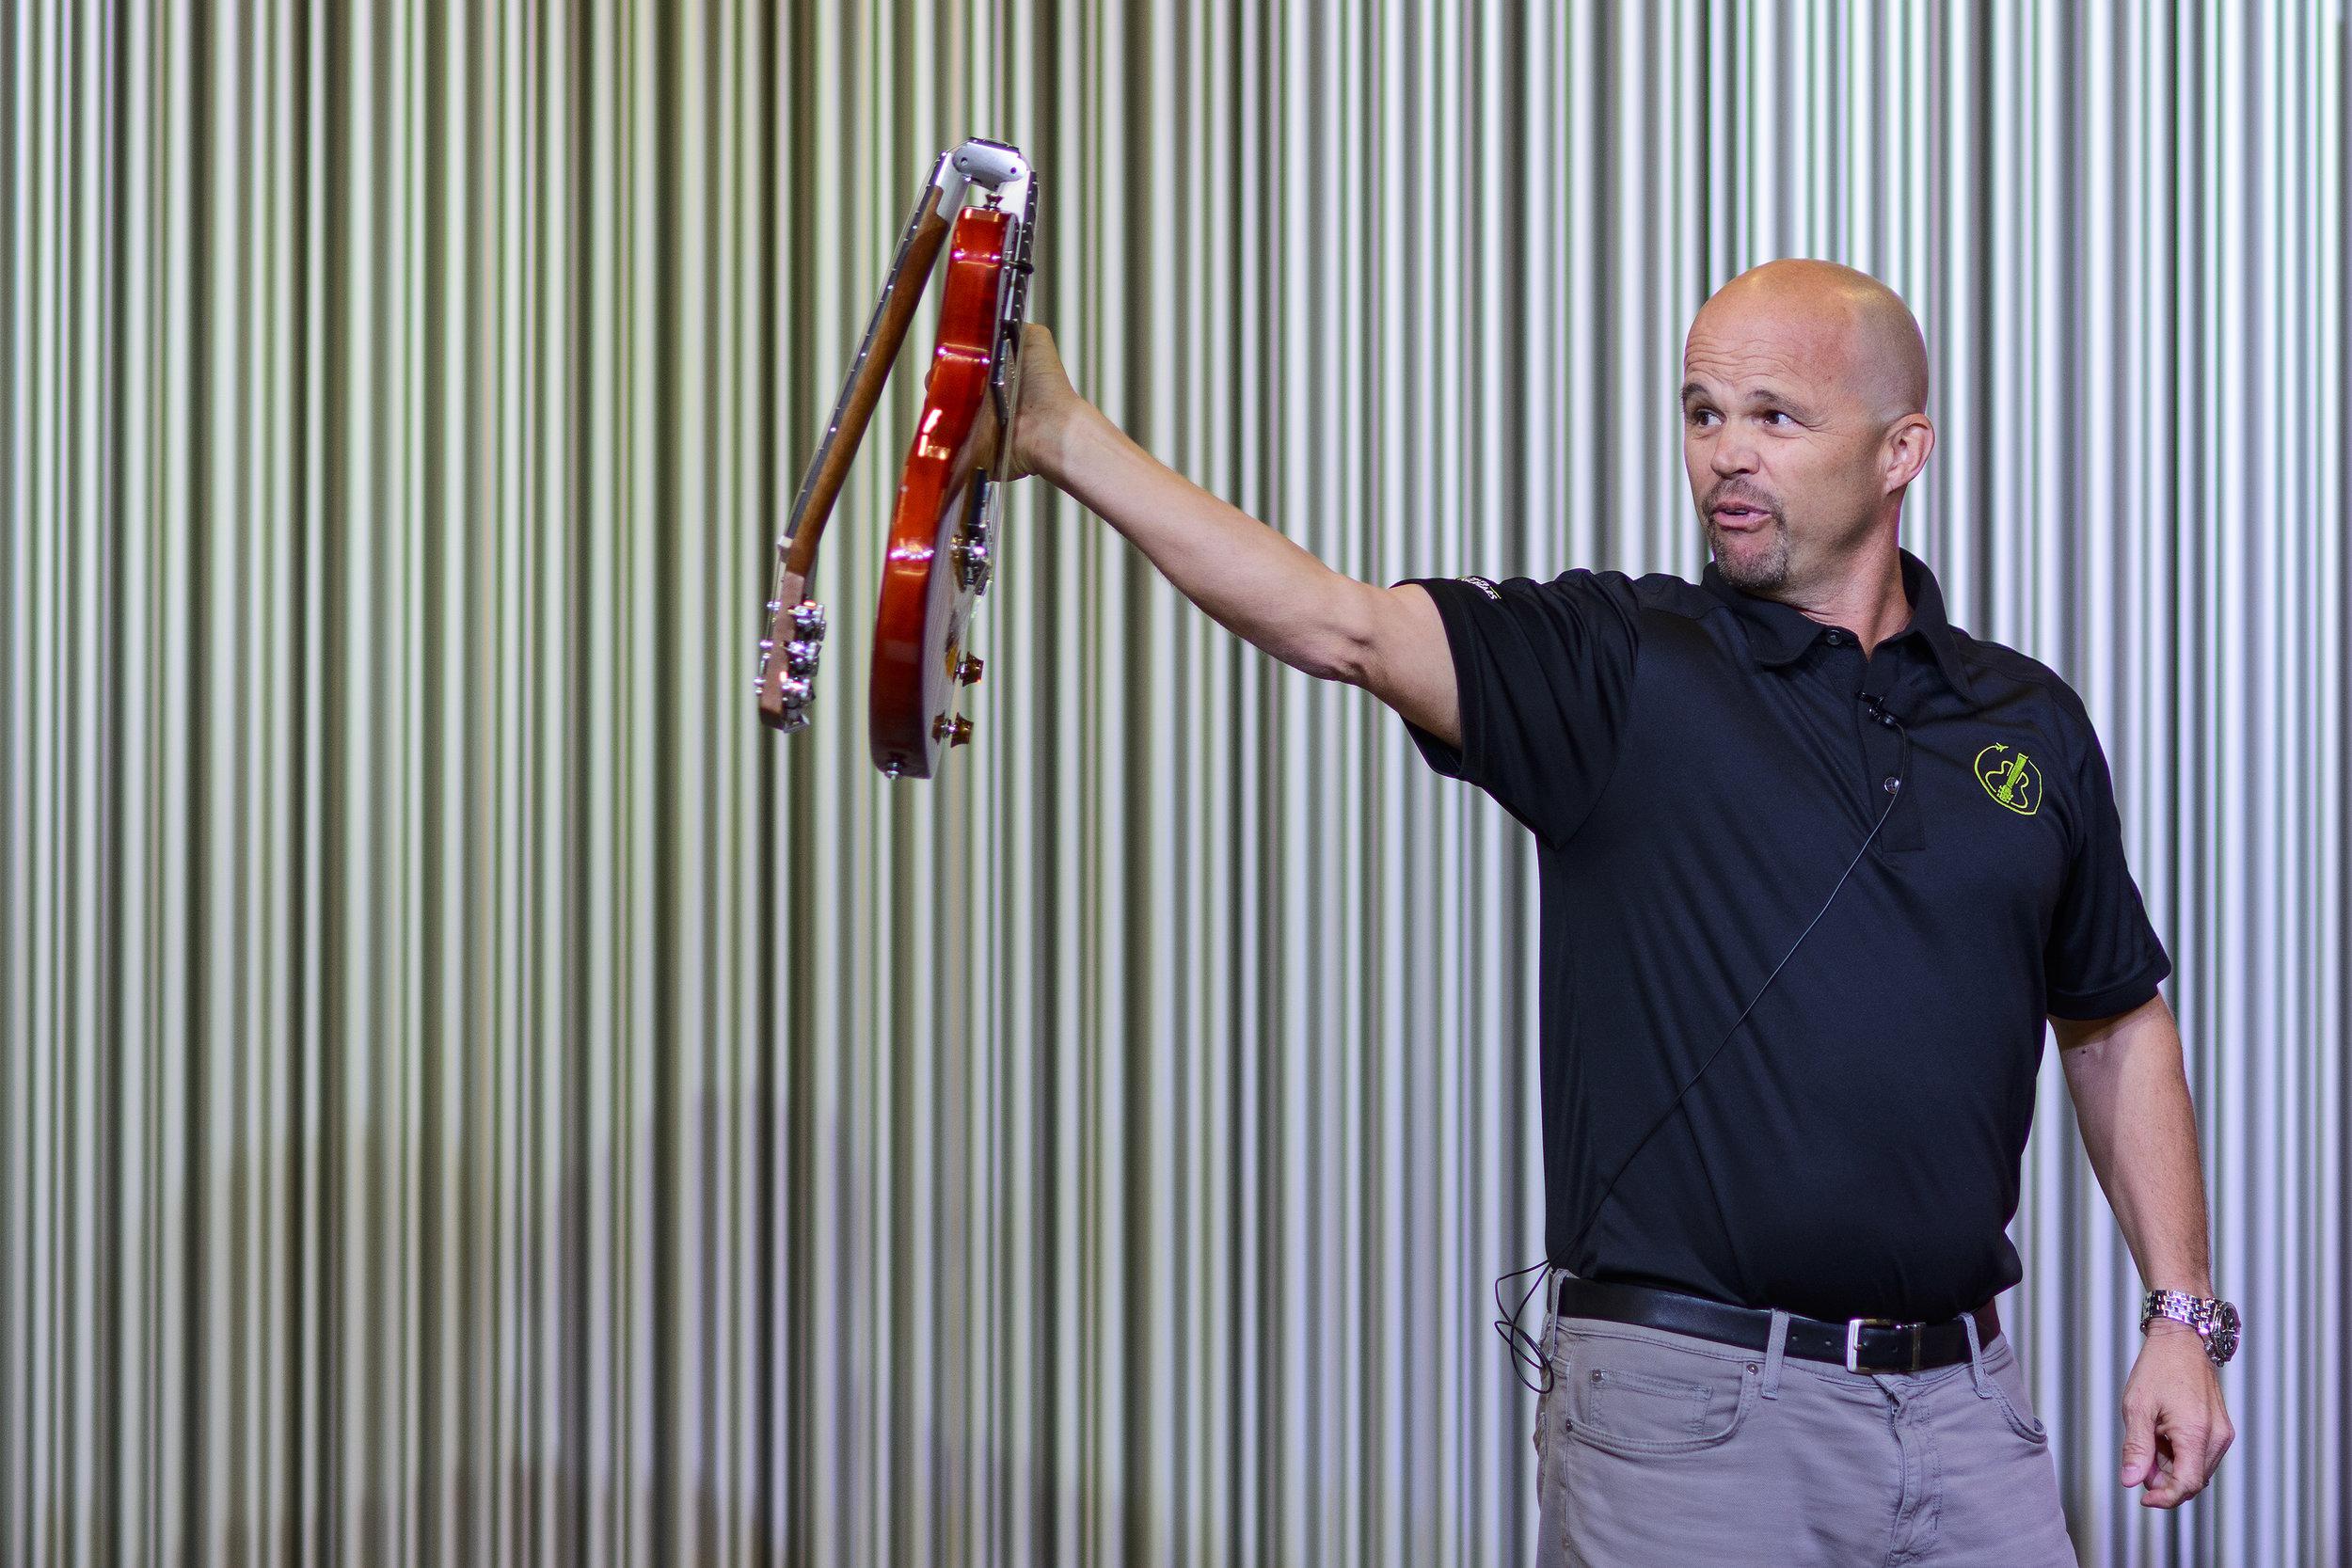 Presenting Ciari Travel Guitars at Project Music Showcase